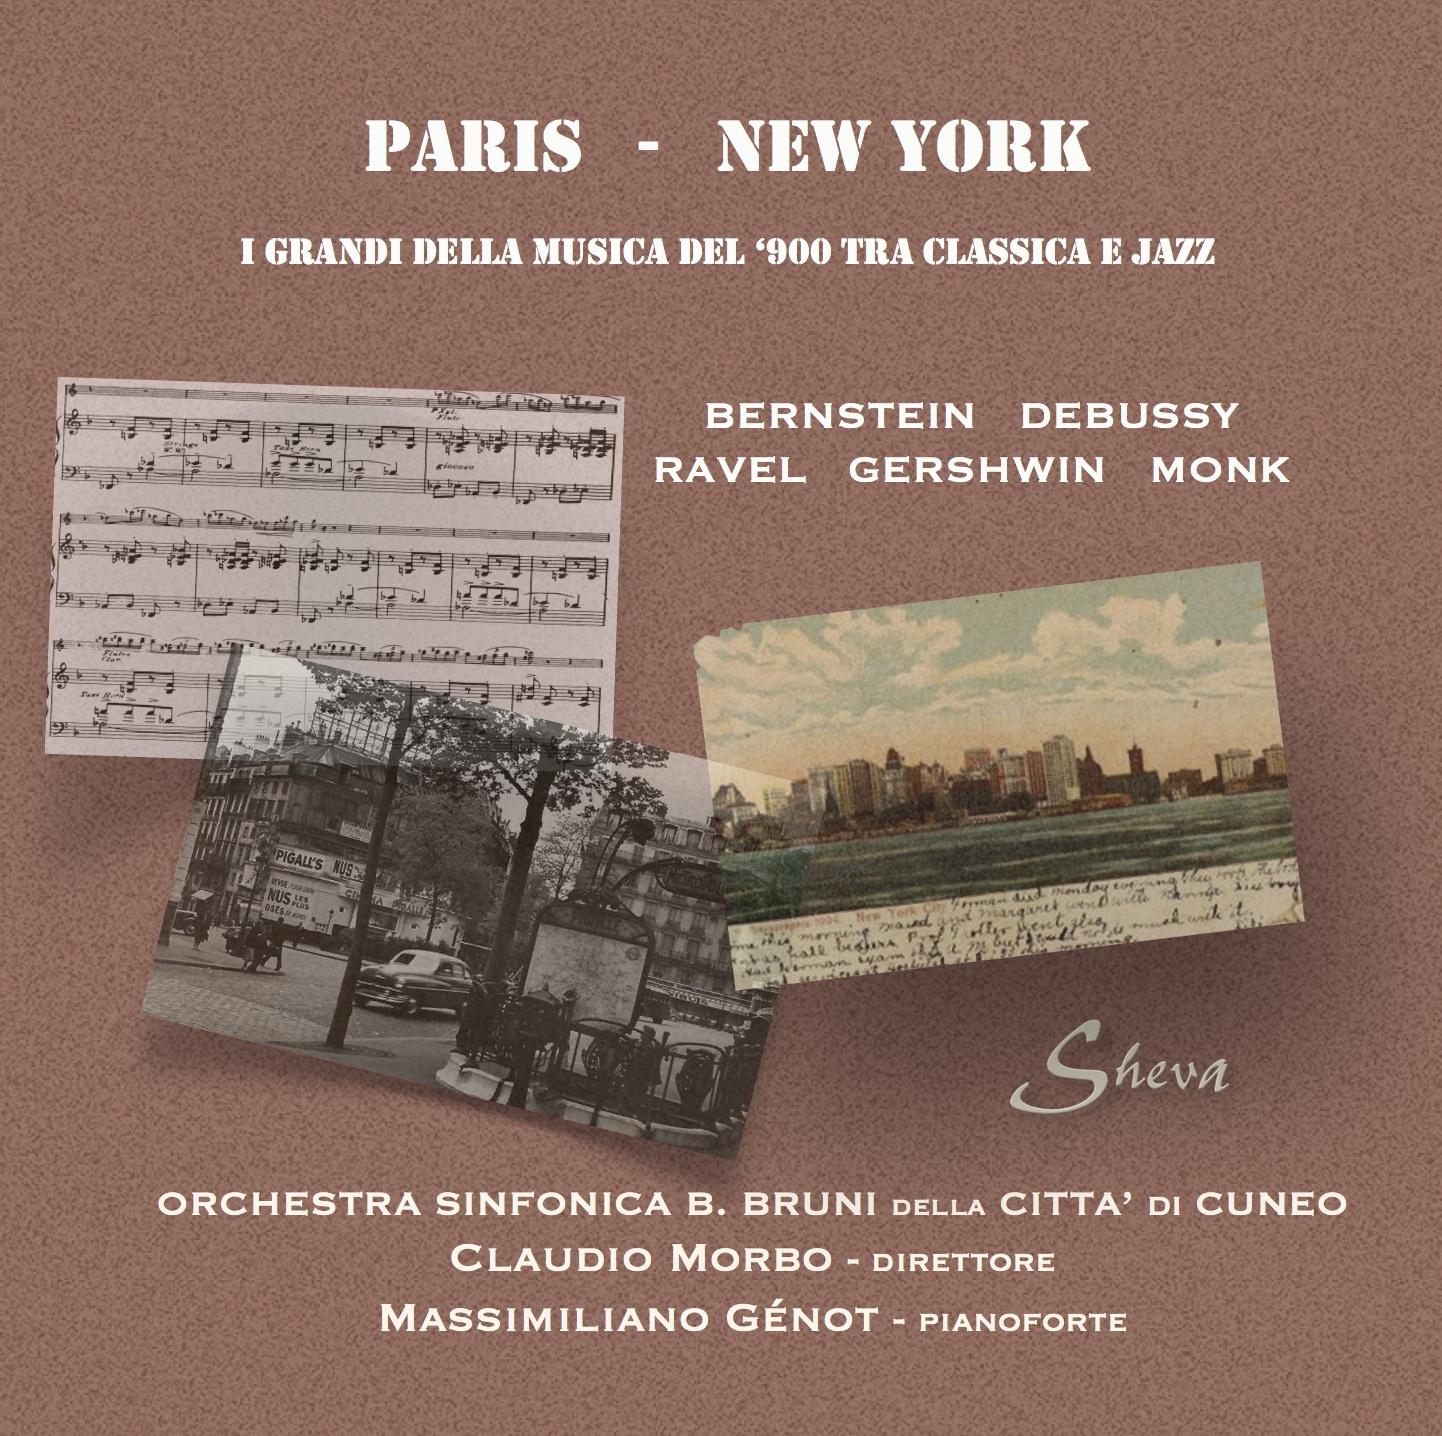 SHEVA 111 PARIS - NEW YORK Bernstein Debussy Ravel Monk Gershwin